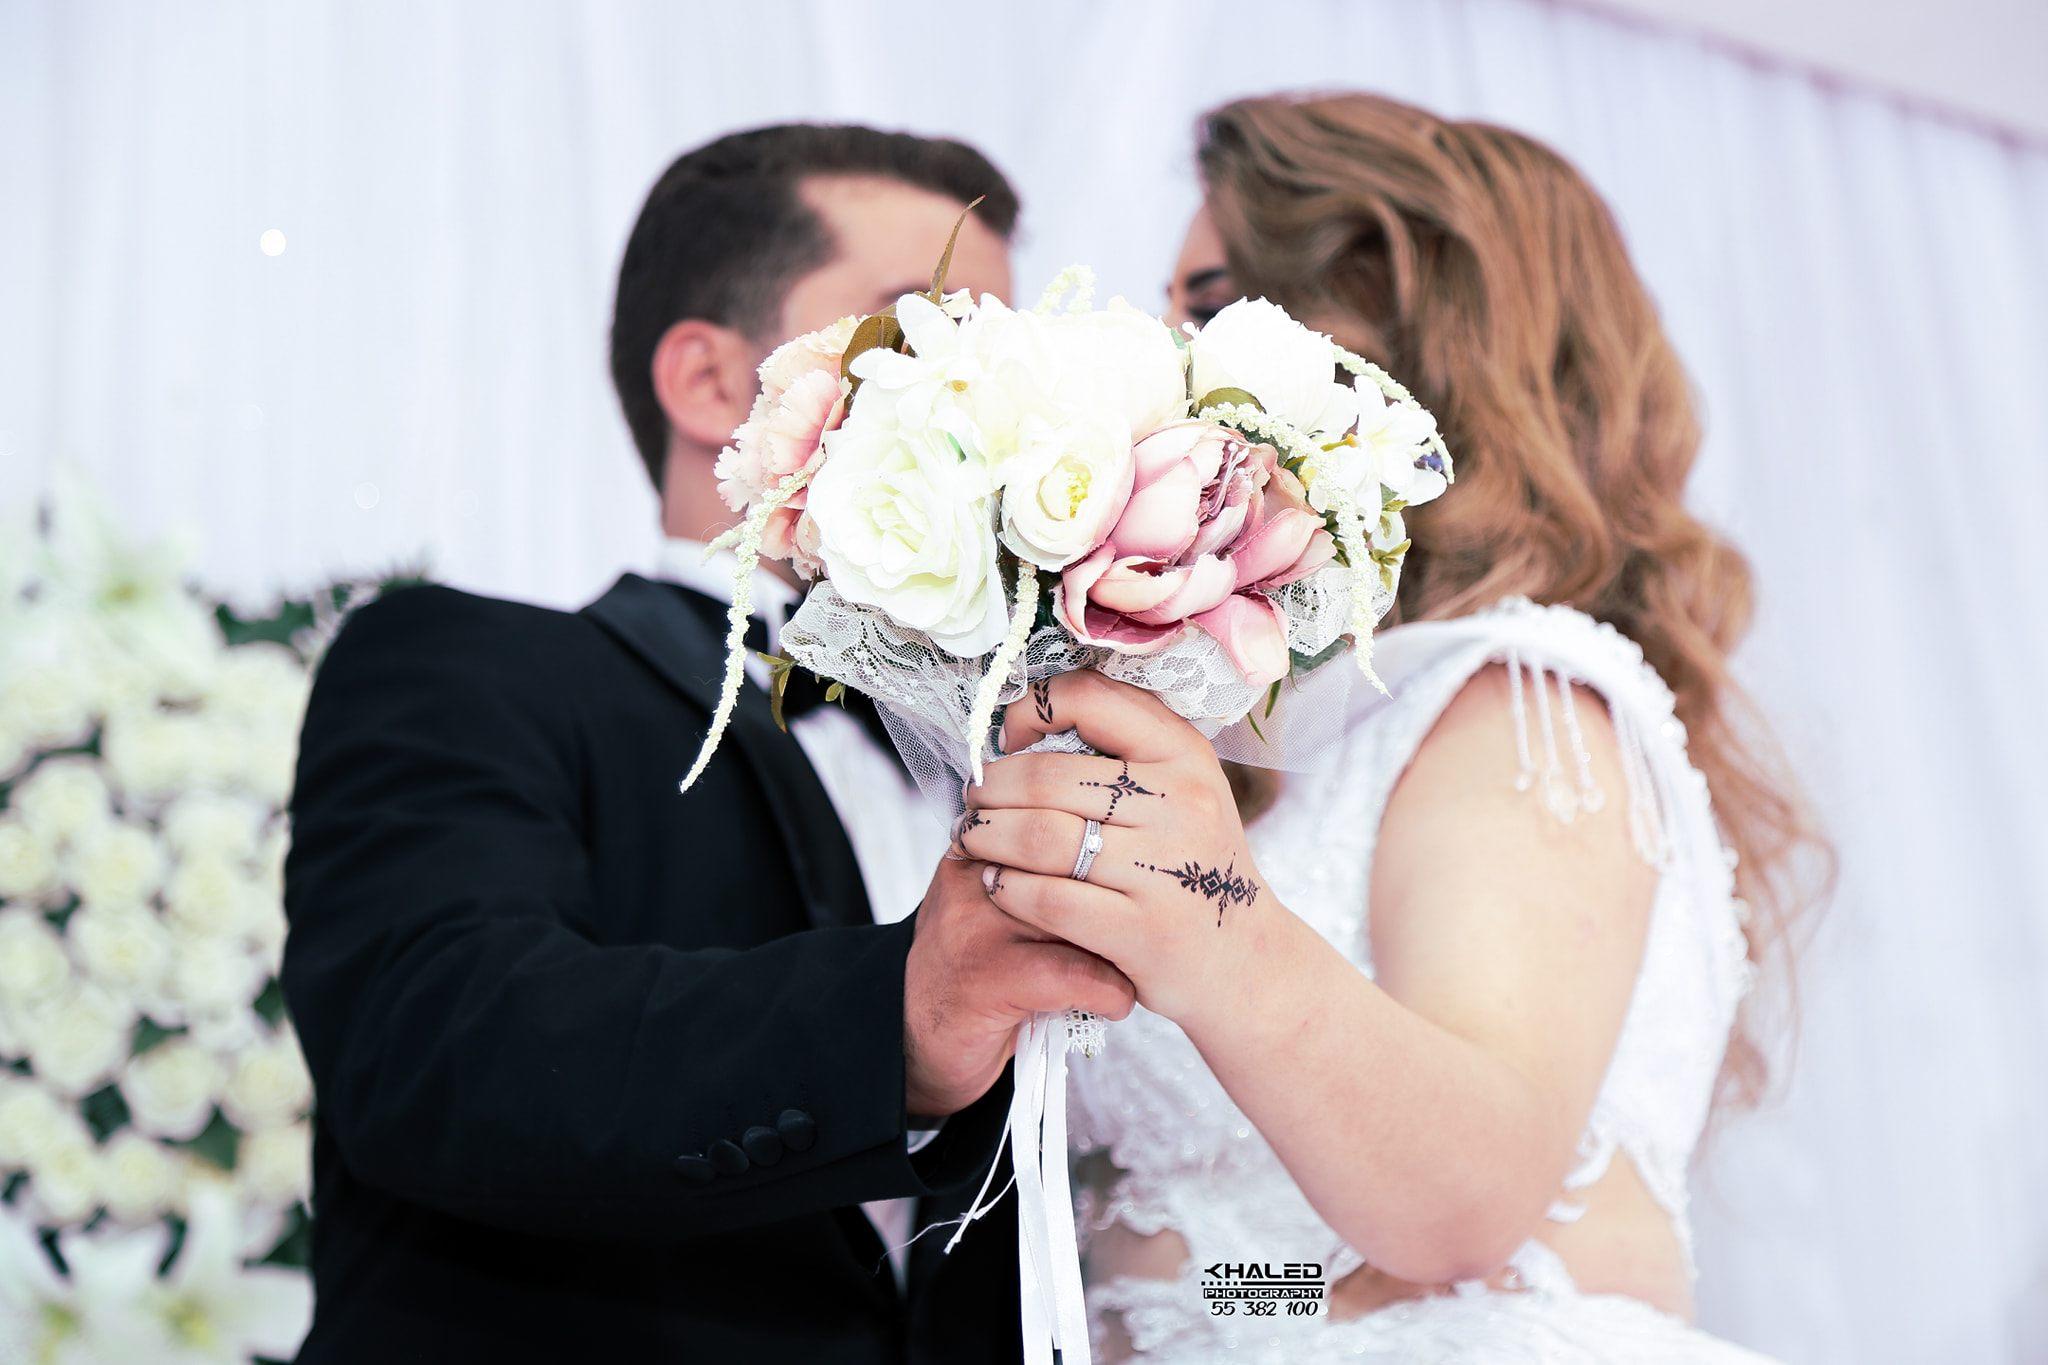 fida3_plus_belles_mariées_tunisiennes_186_2019